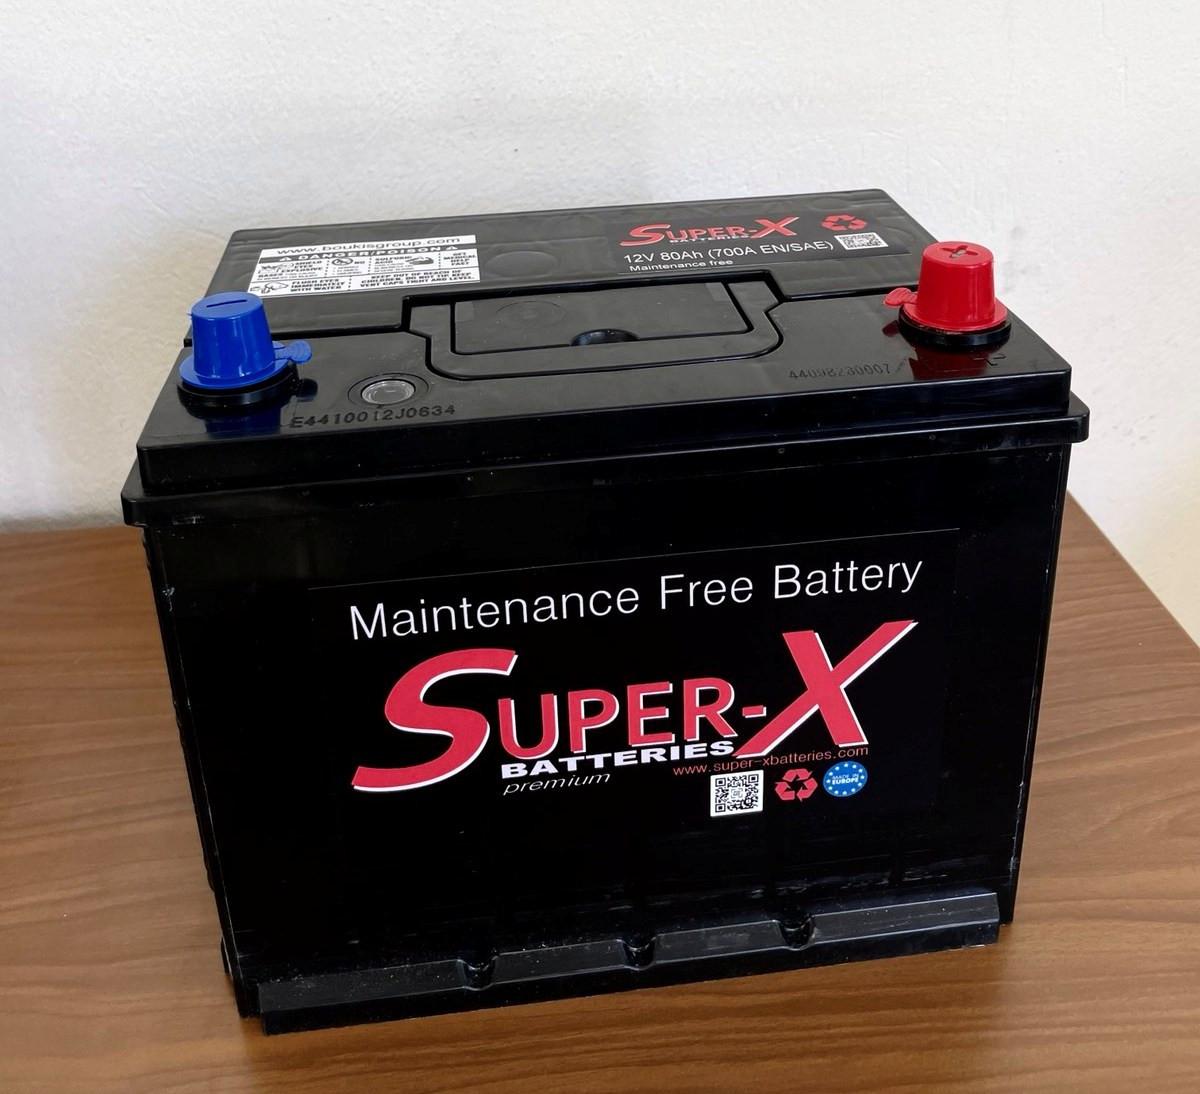 SUPER-X BATTERIES